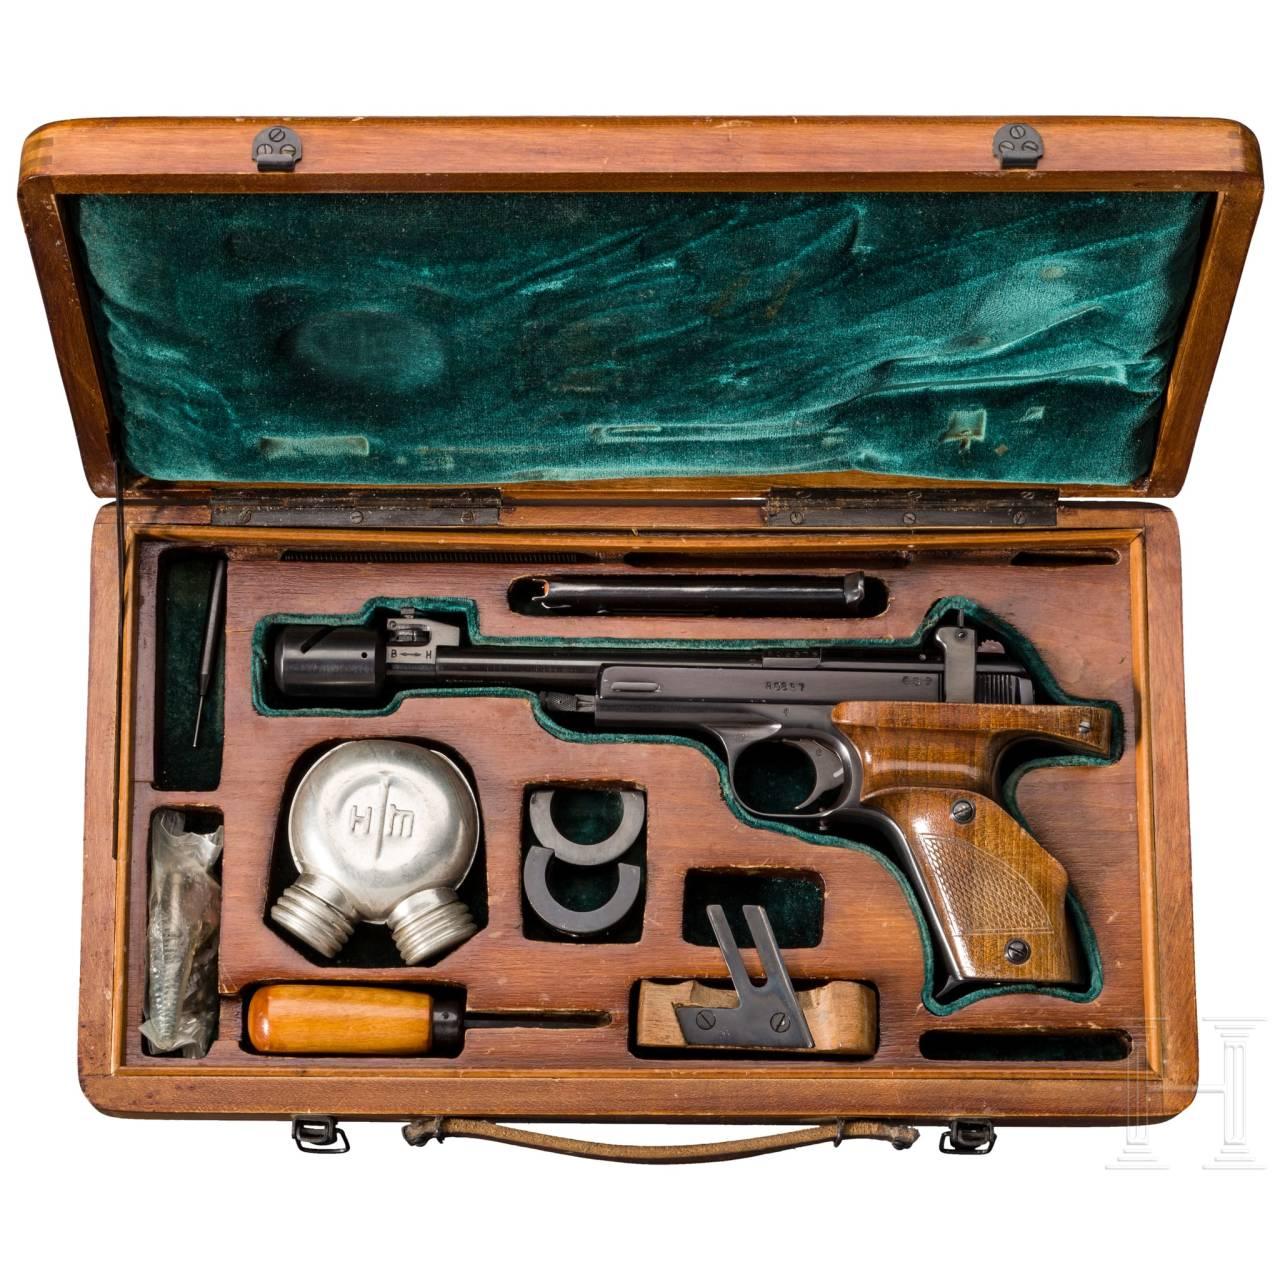 Sportpistole MCM Margolin, im Koffer